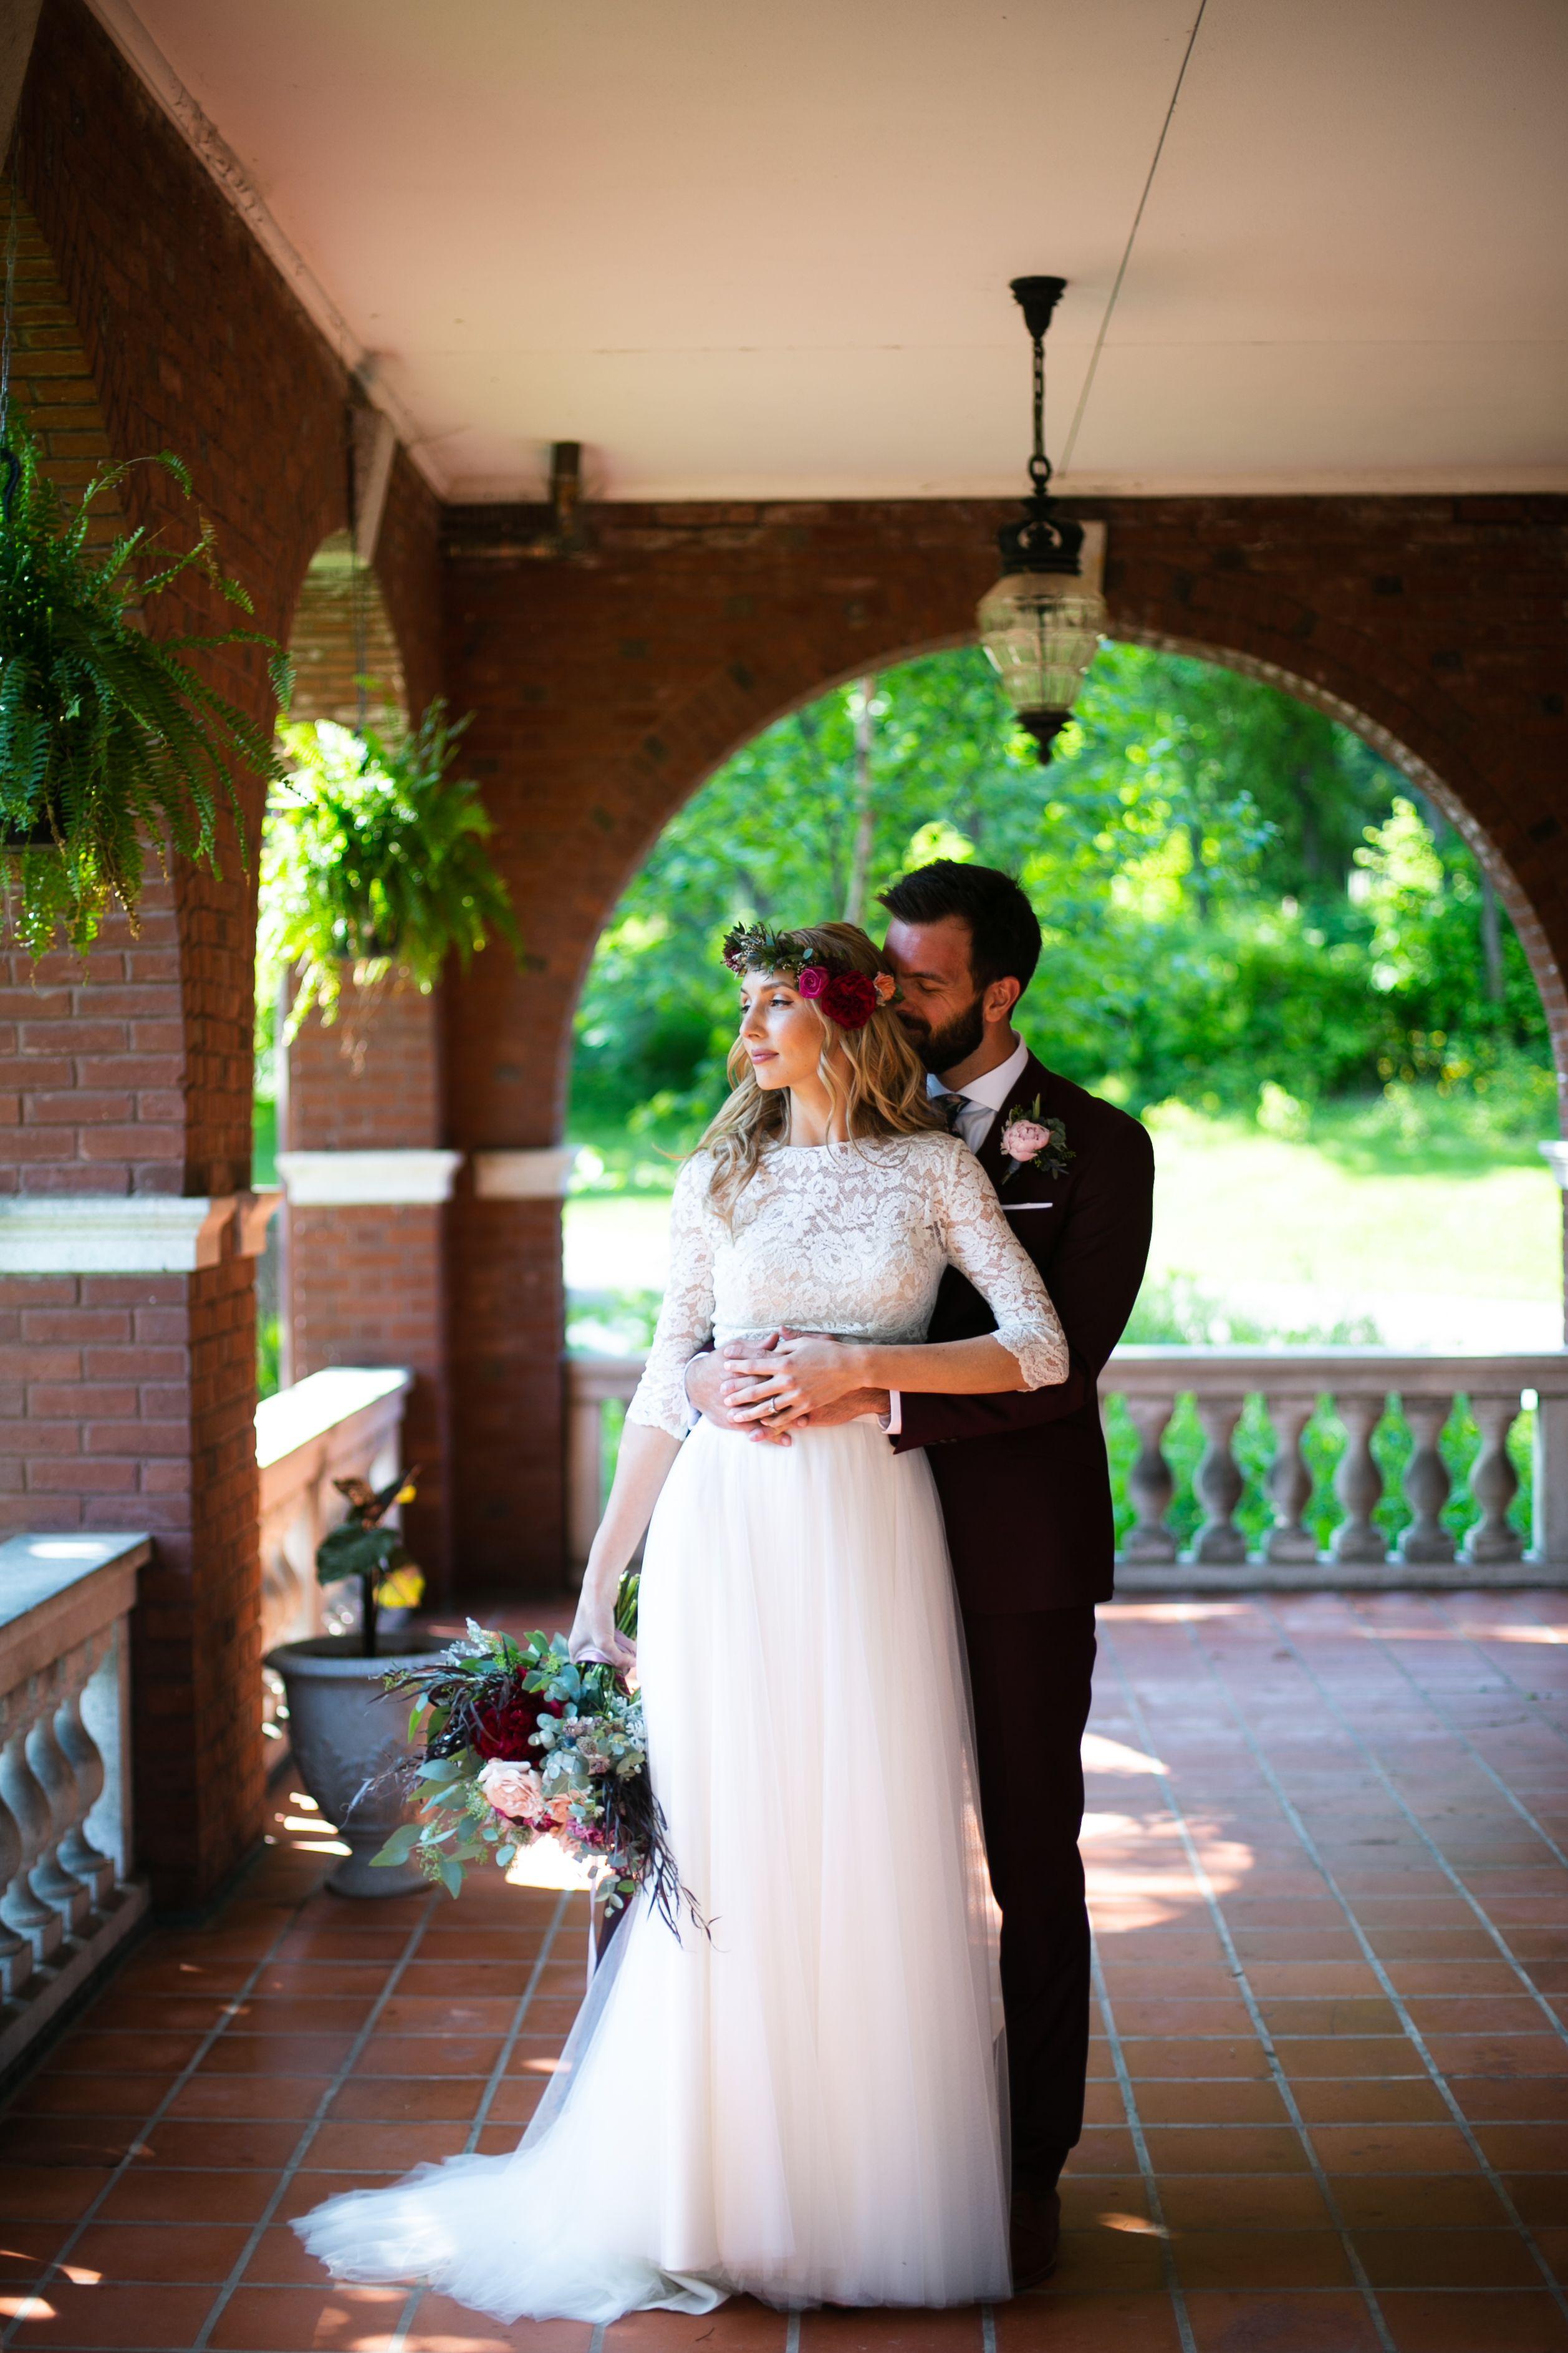 Glensheen Mansion Duluth Mn Weddings In 2020 Glensheen Wedding Dresses Wedding